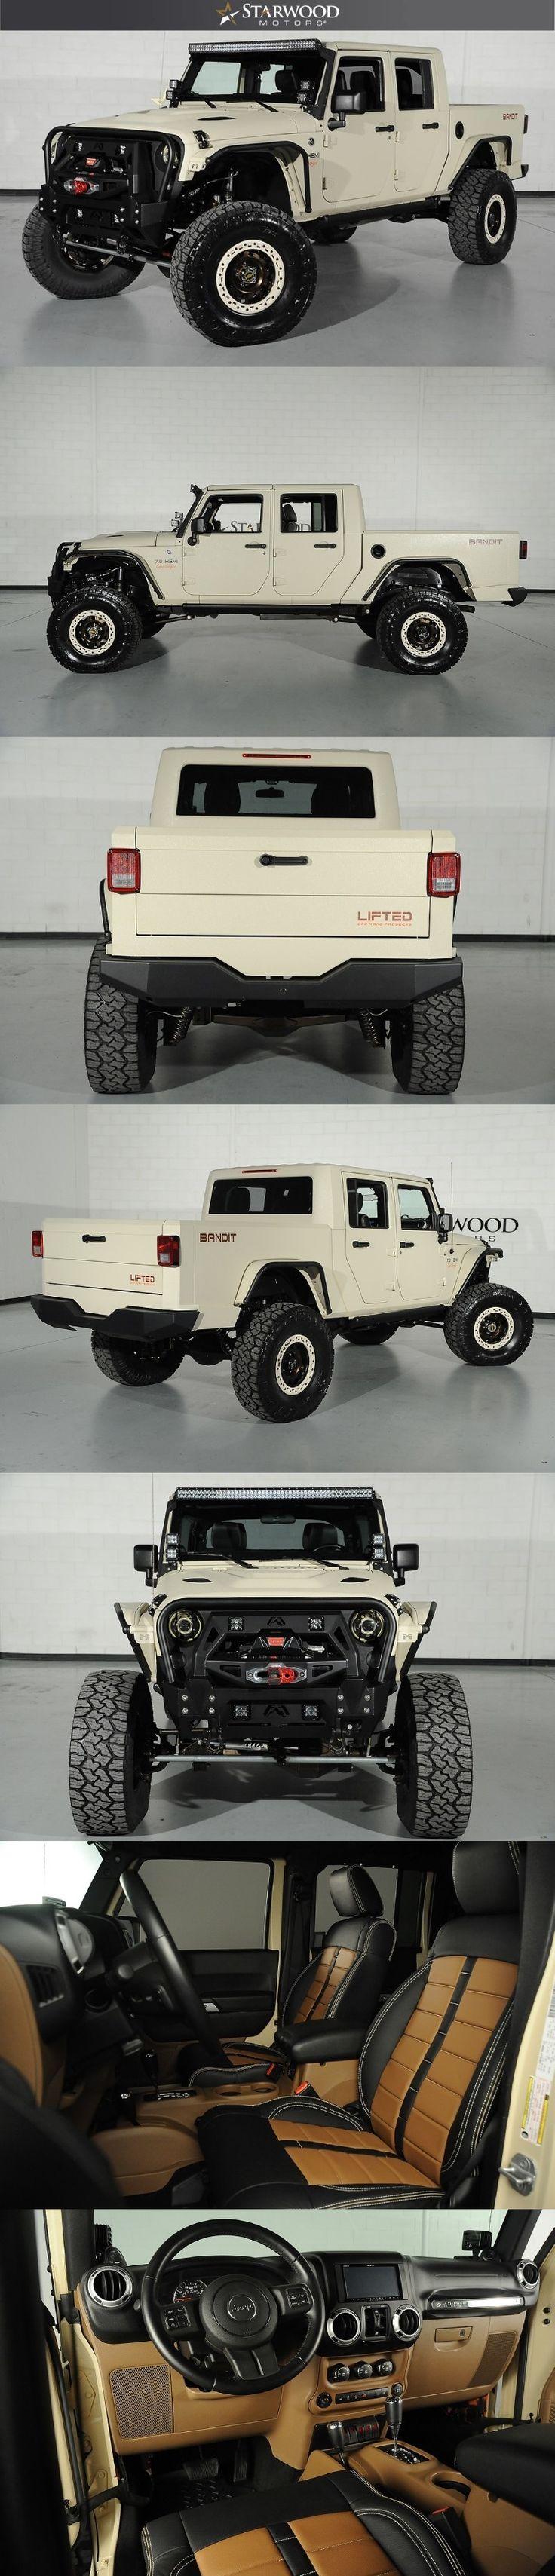 Starwood Motors Bandit Jeep.... if only.